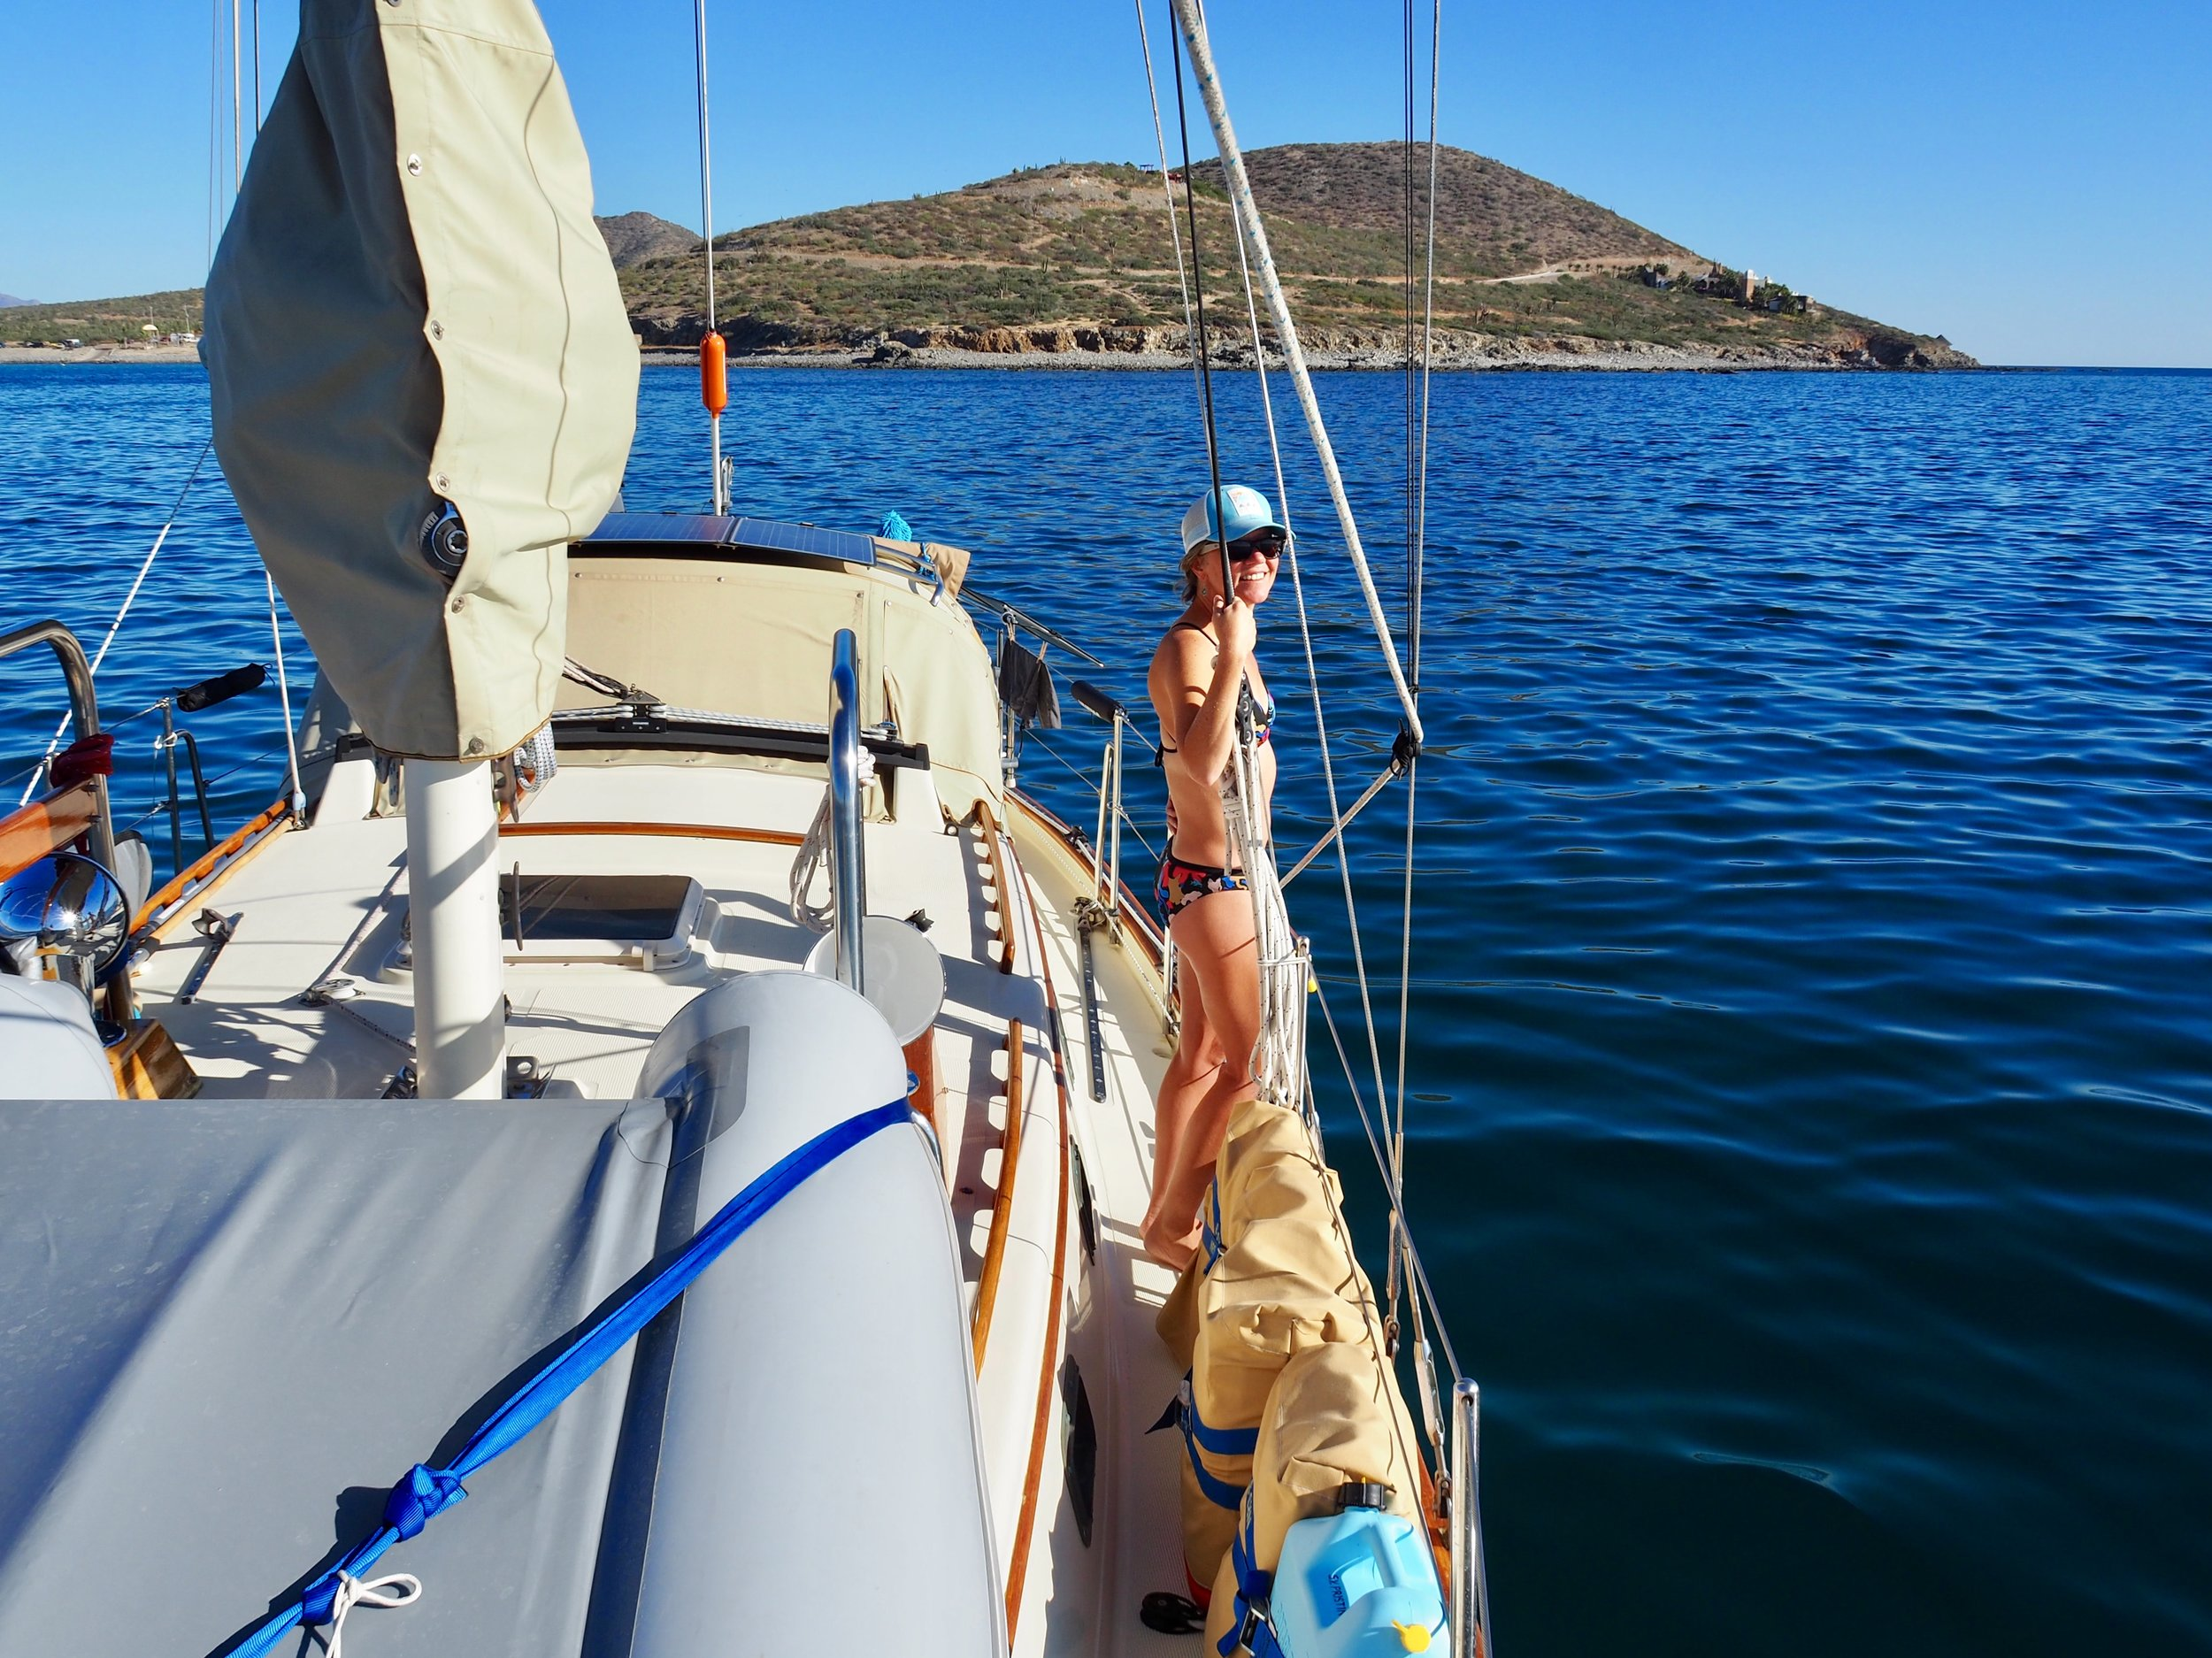 Anchored at Bahia de Los Muertos, waiting to cross